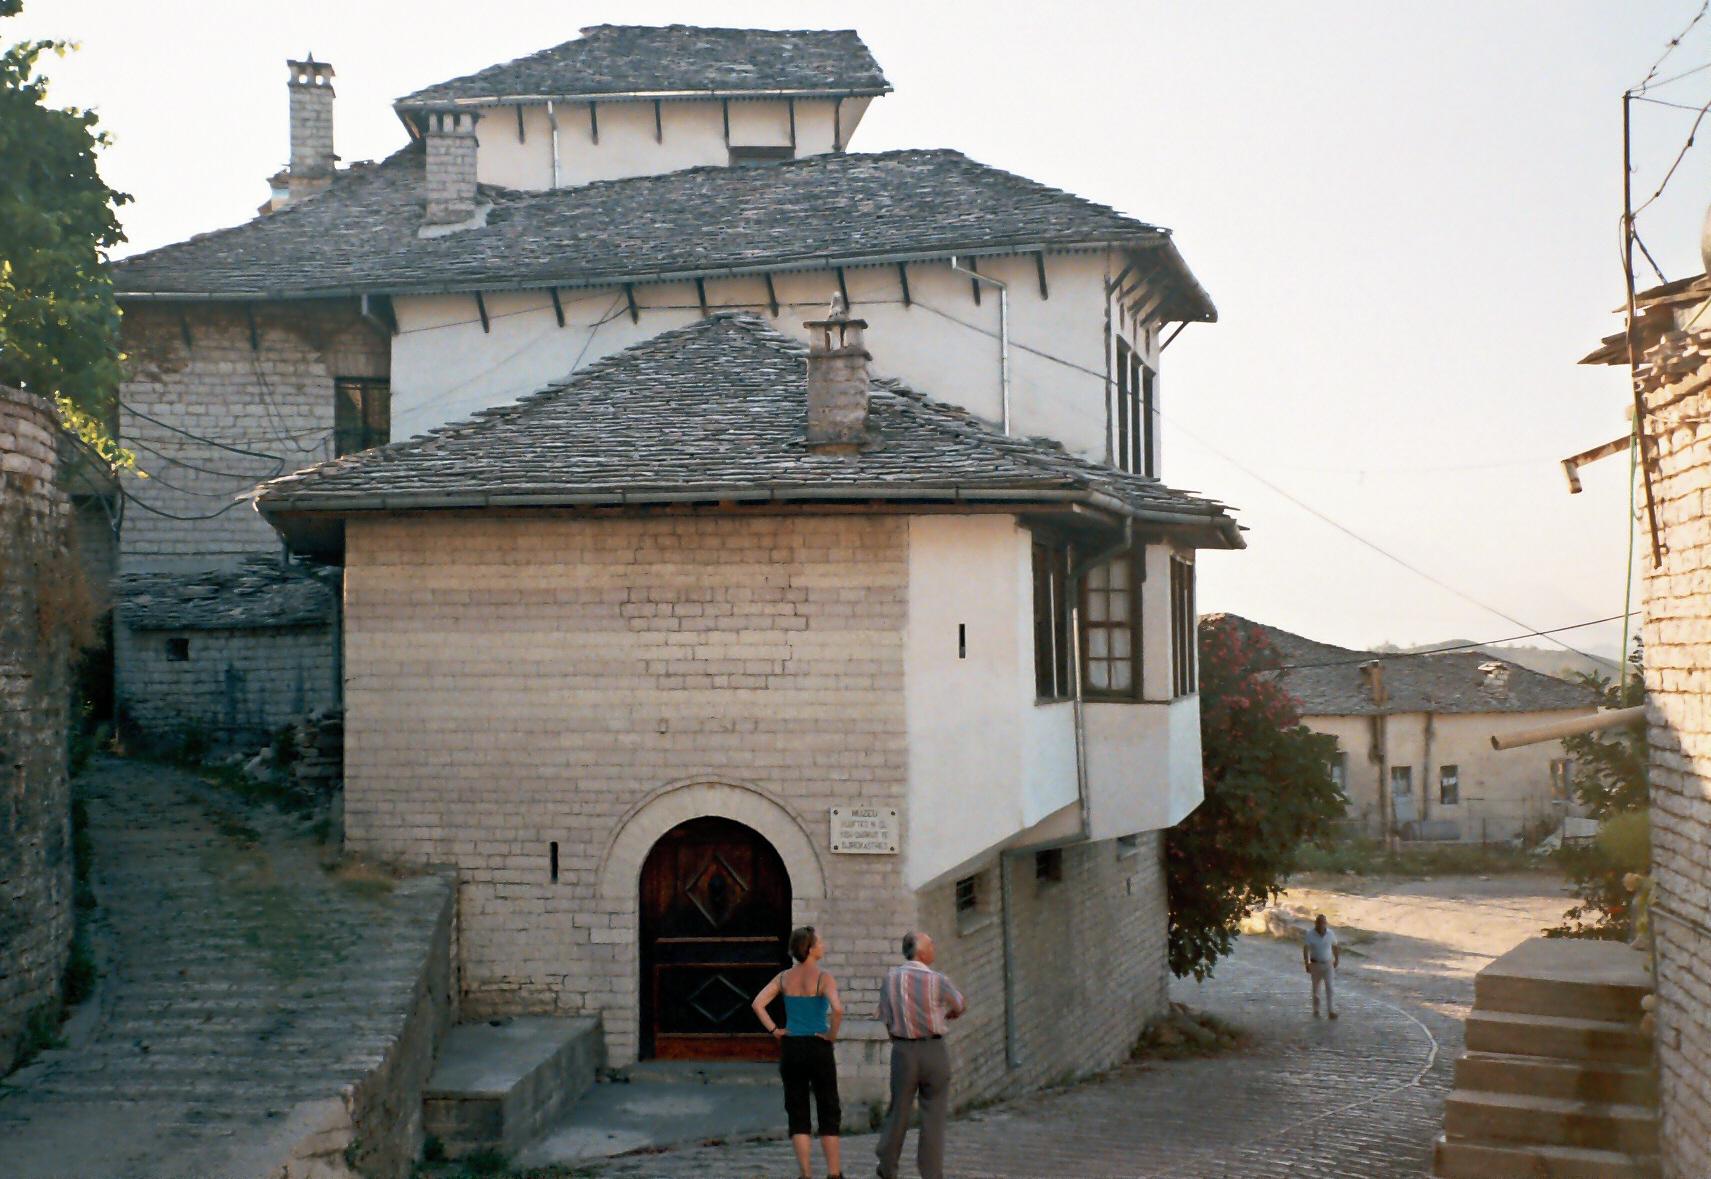 The house where Hoxha grew up in Gjirokast r